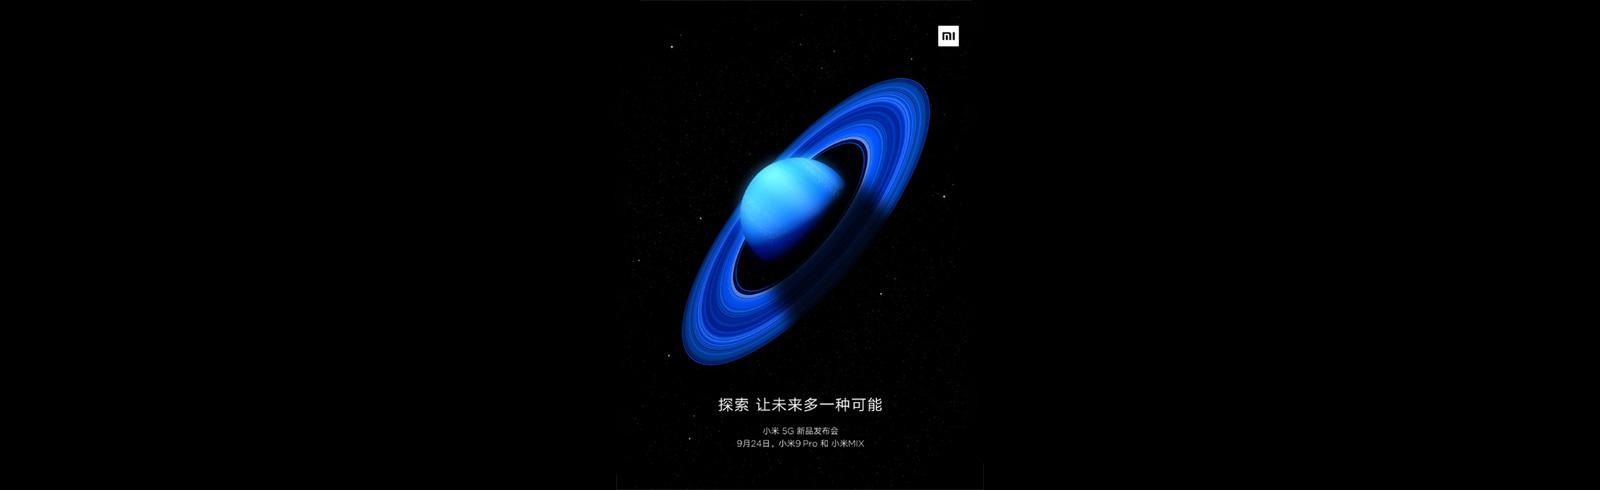 Xiaomi Mi MIX 4 to be named Xiaomi Mi MIX Alpha?